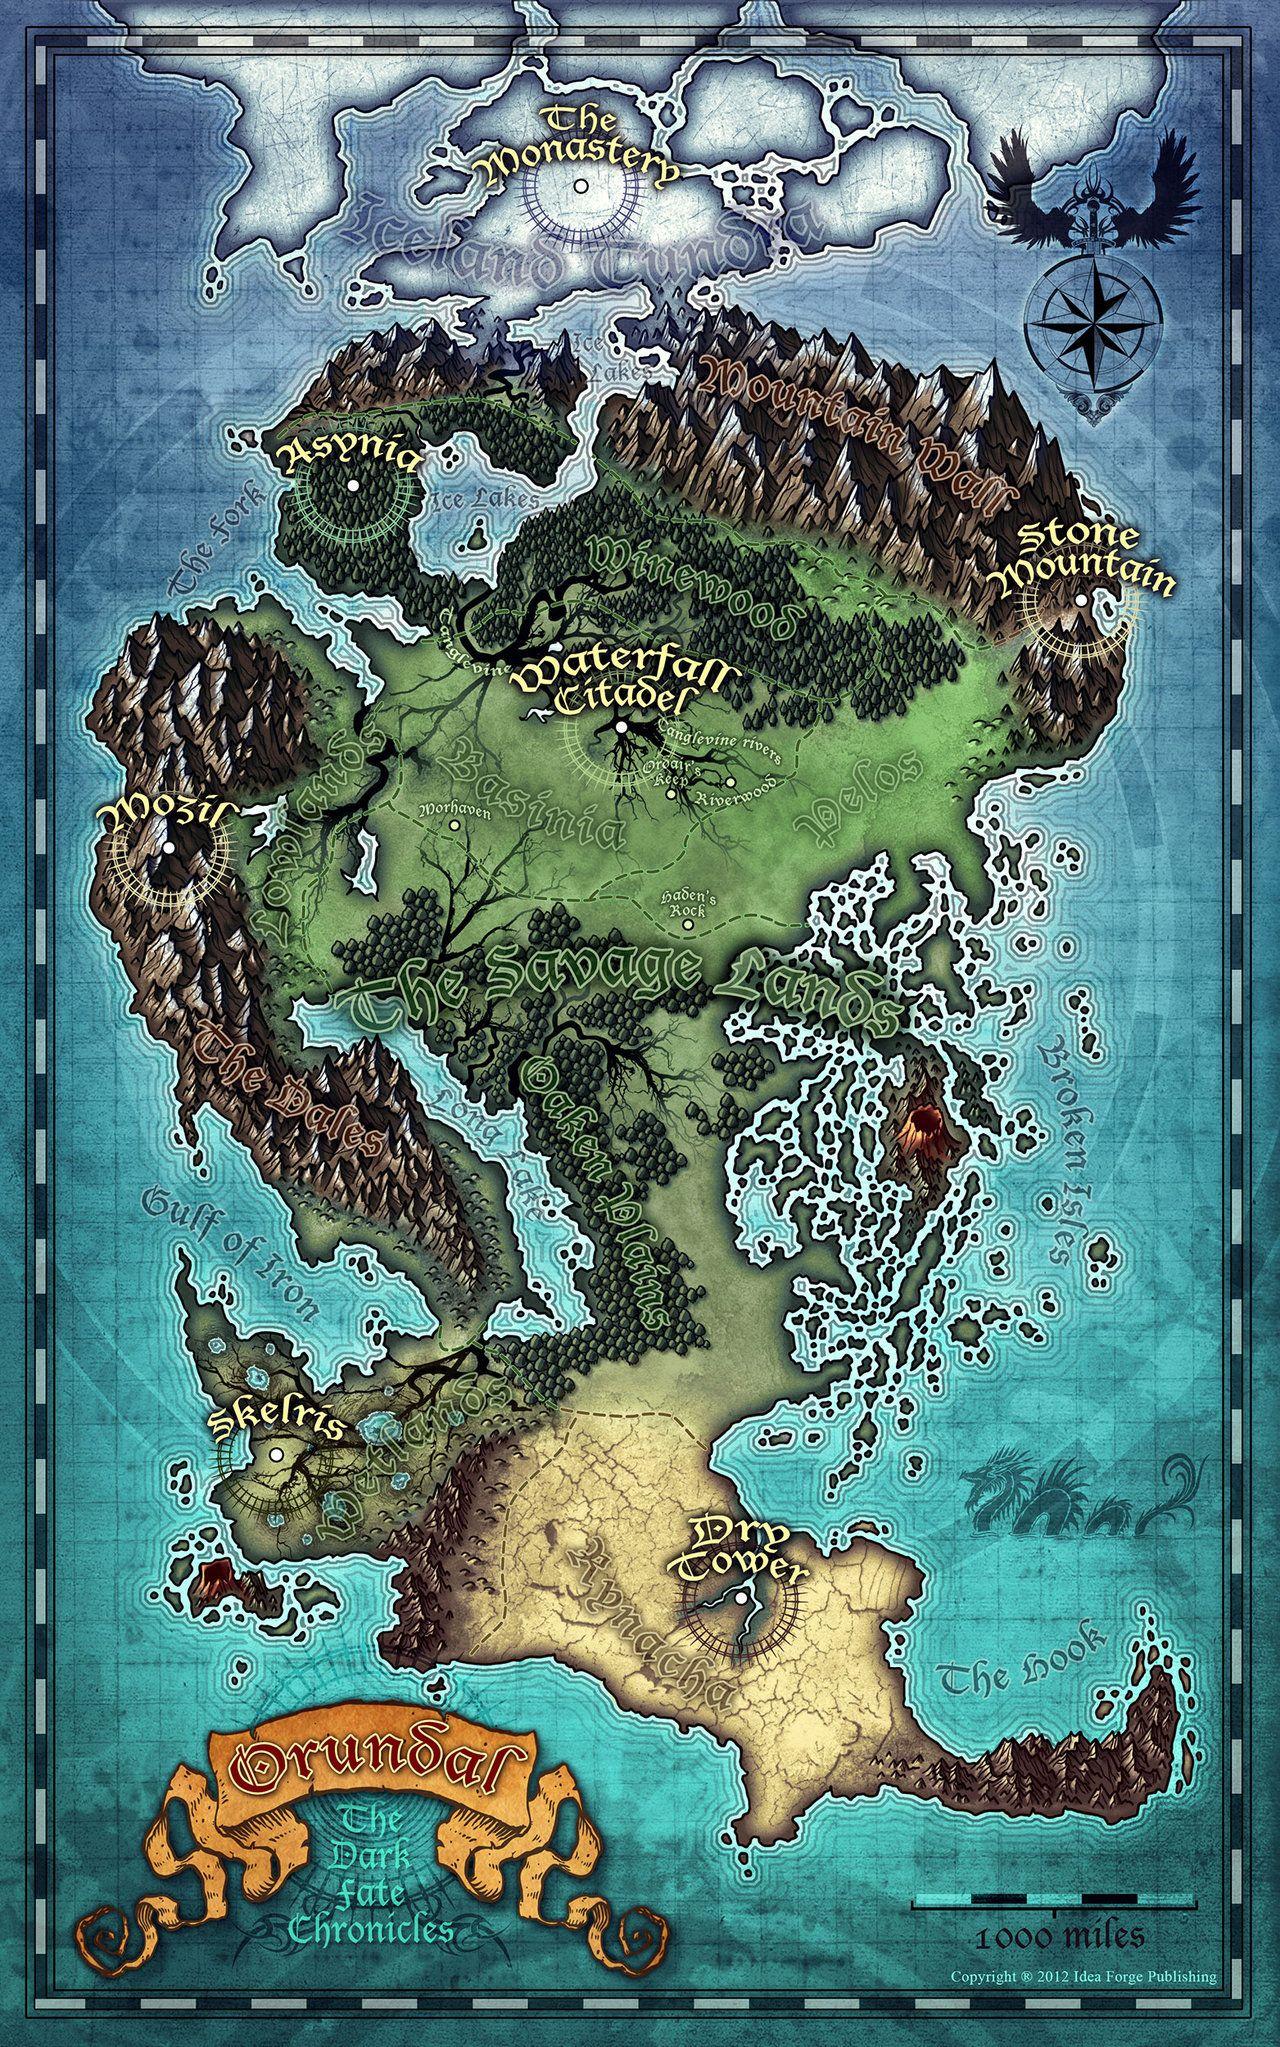 Map of orundal by howietzer on deviantart fantasy maps and floor map of orundal by howietzer on deviantart gumiabroncs Gallery